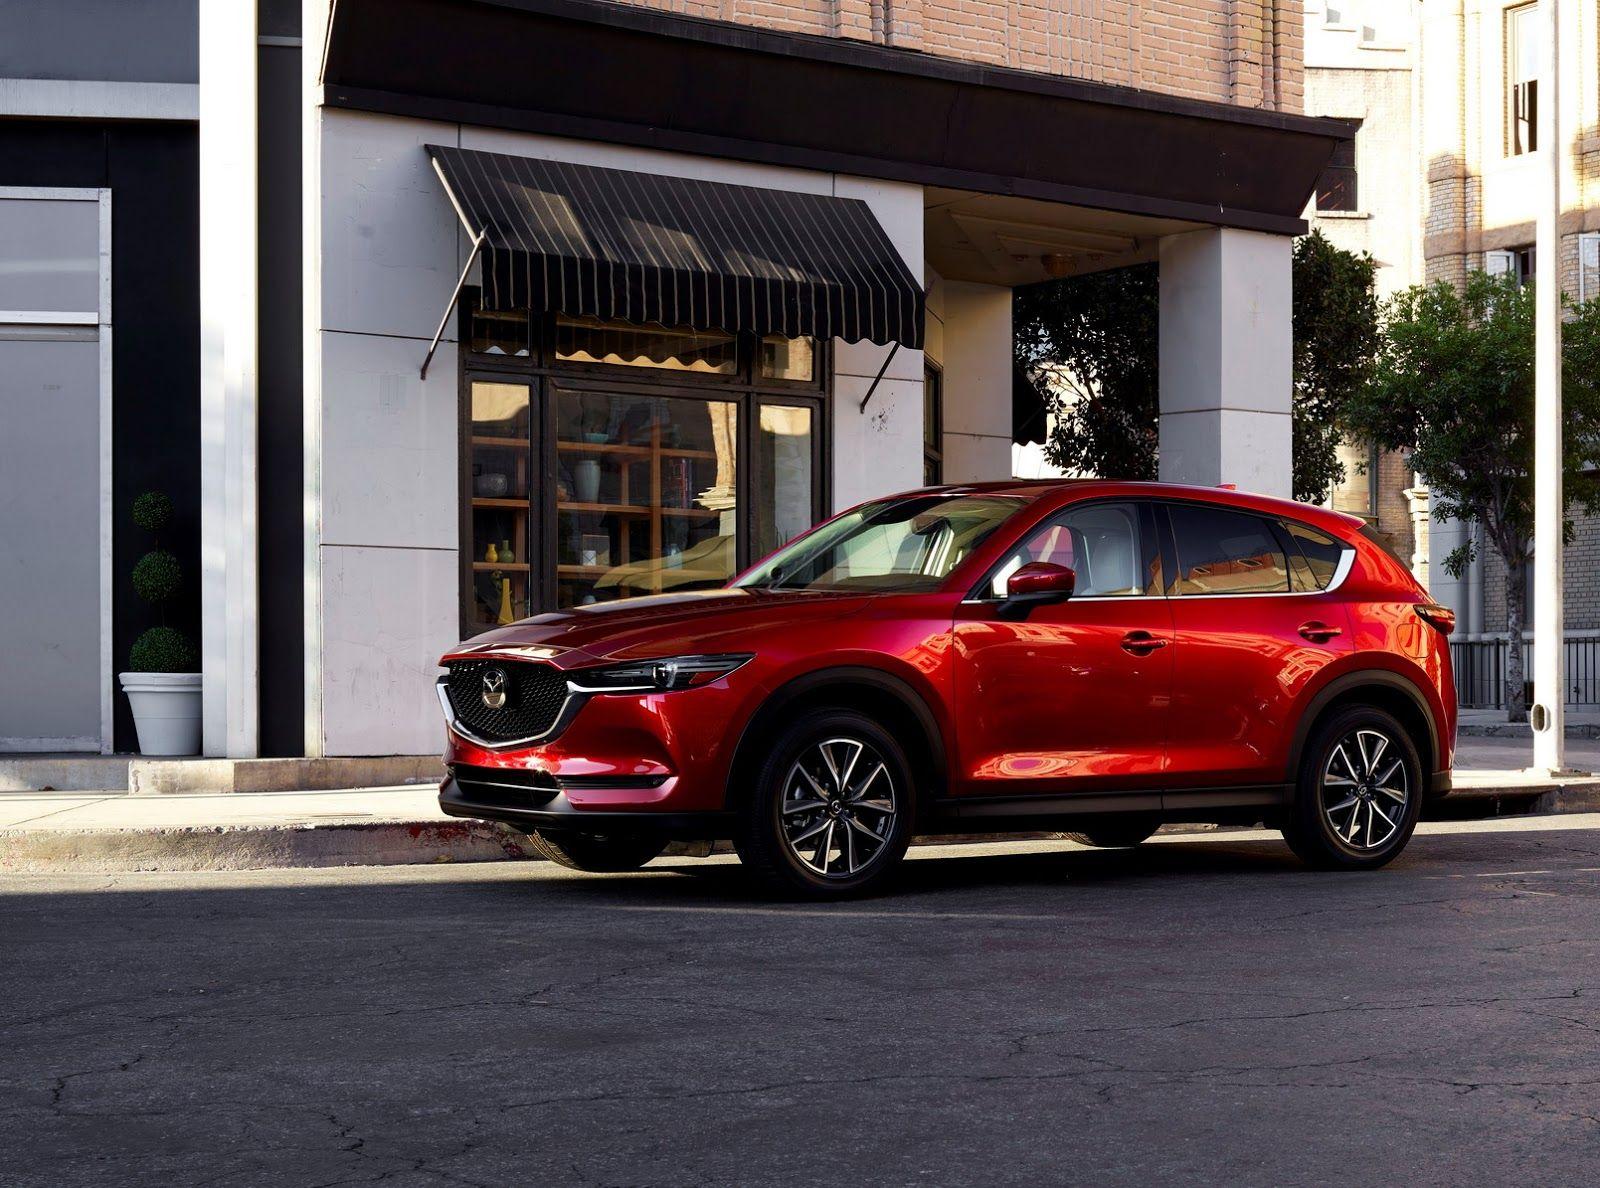 Mazda S All New 2017 Cx 5 Gets Overhauled Design And New Tech Avto